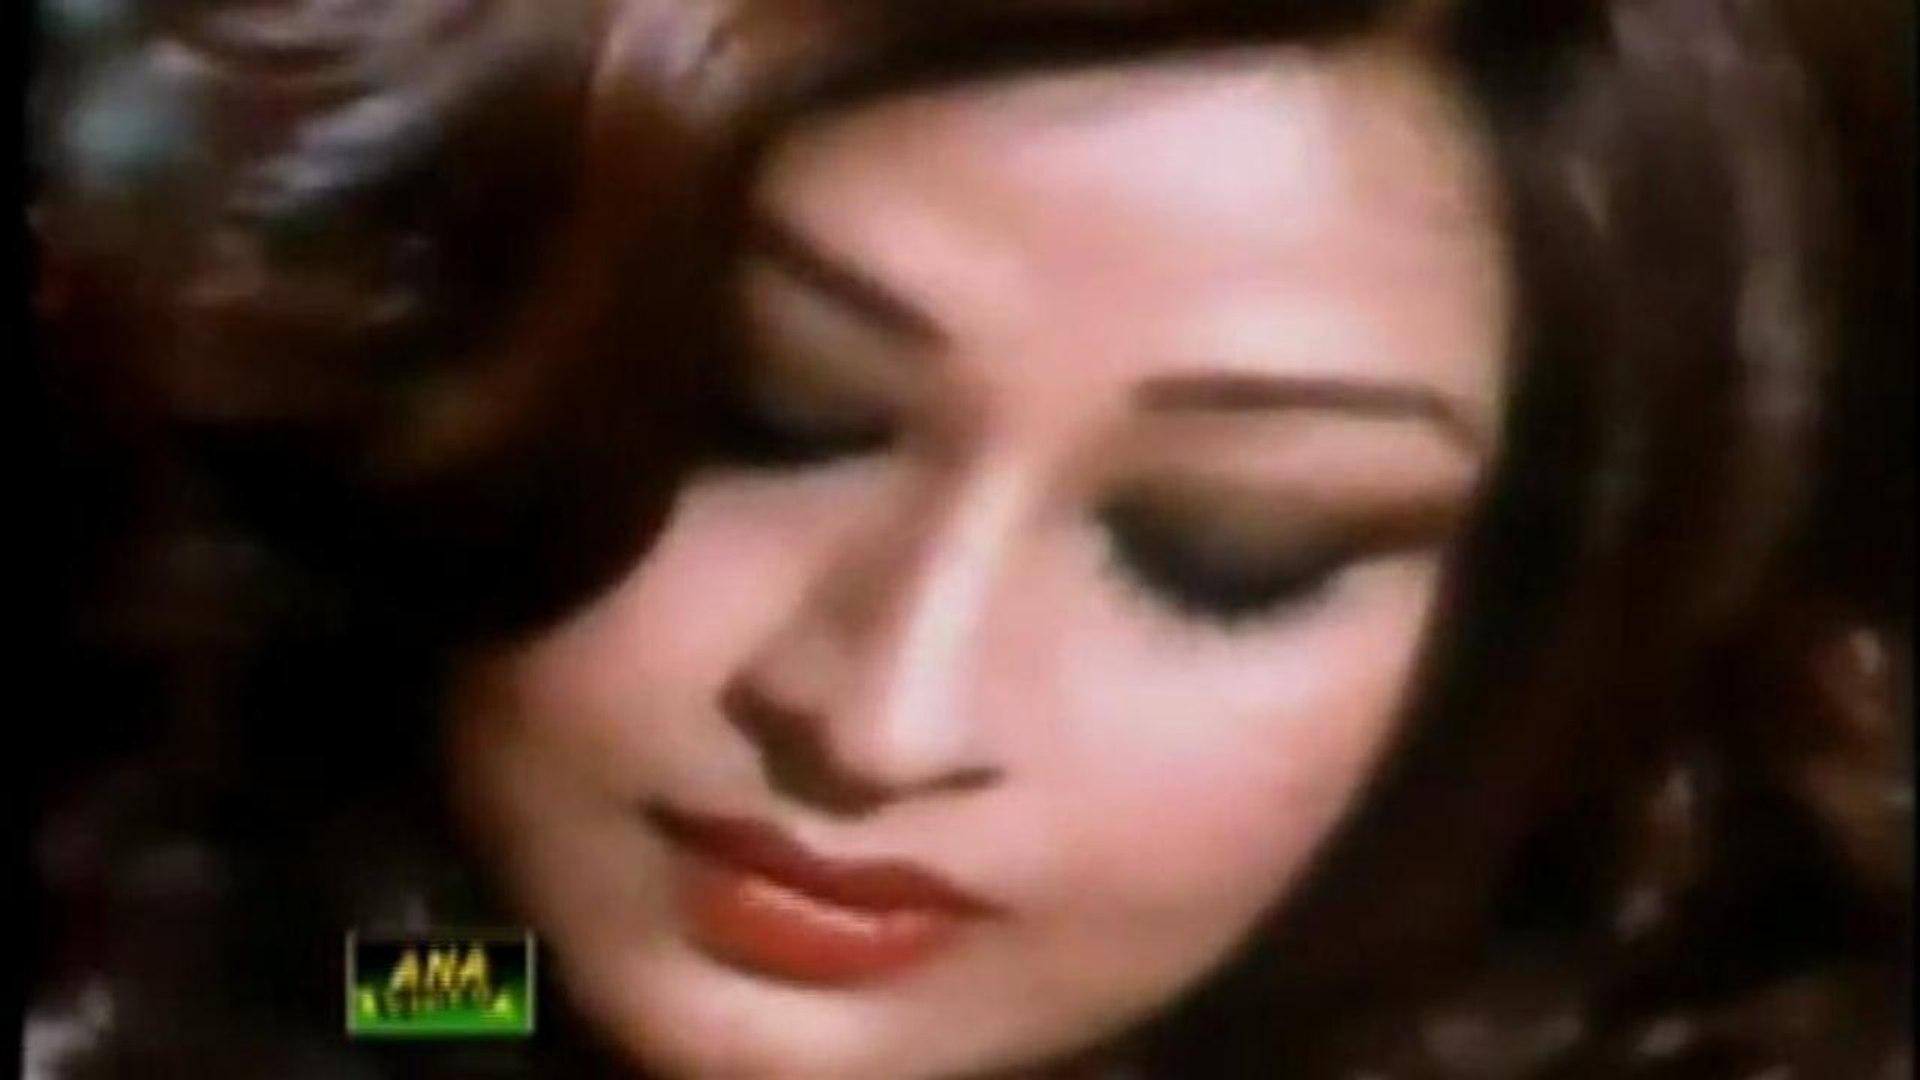 Esa pyaar kernay wala meri jaan tujhay dhoondhay na milay ga ~ Mohammad Ali aur Shabnam ~ Singer Meh